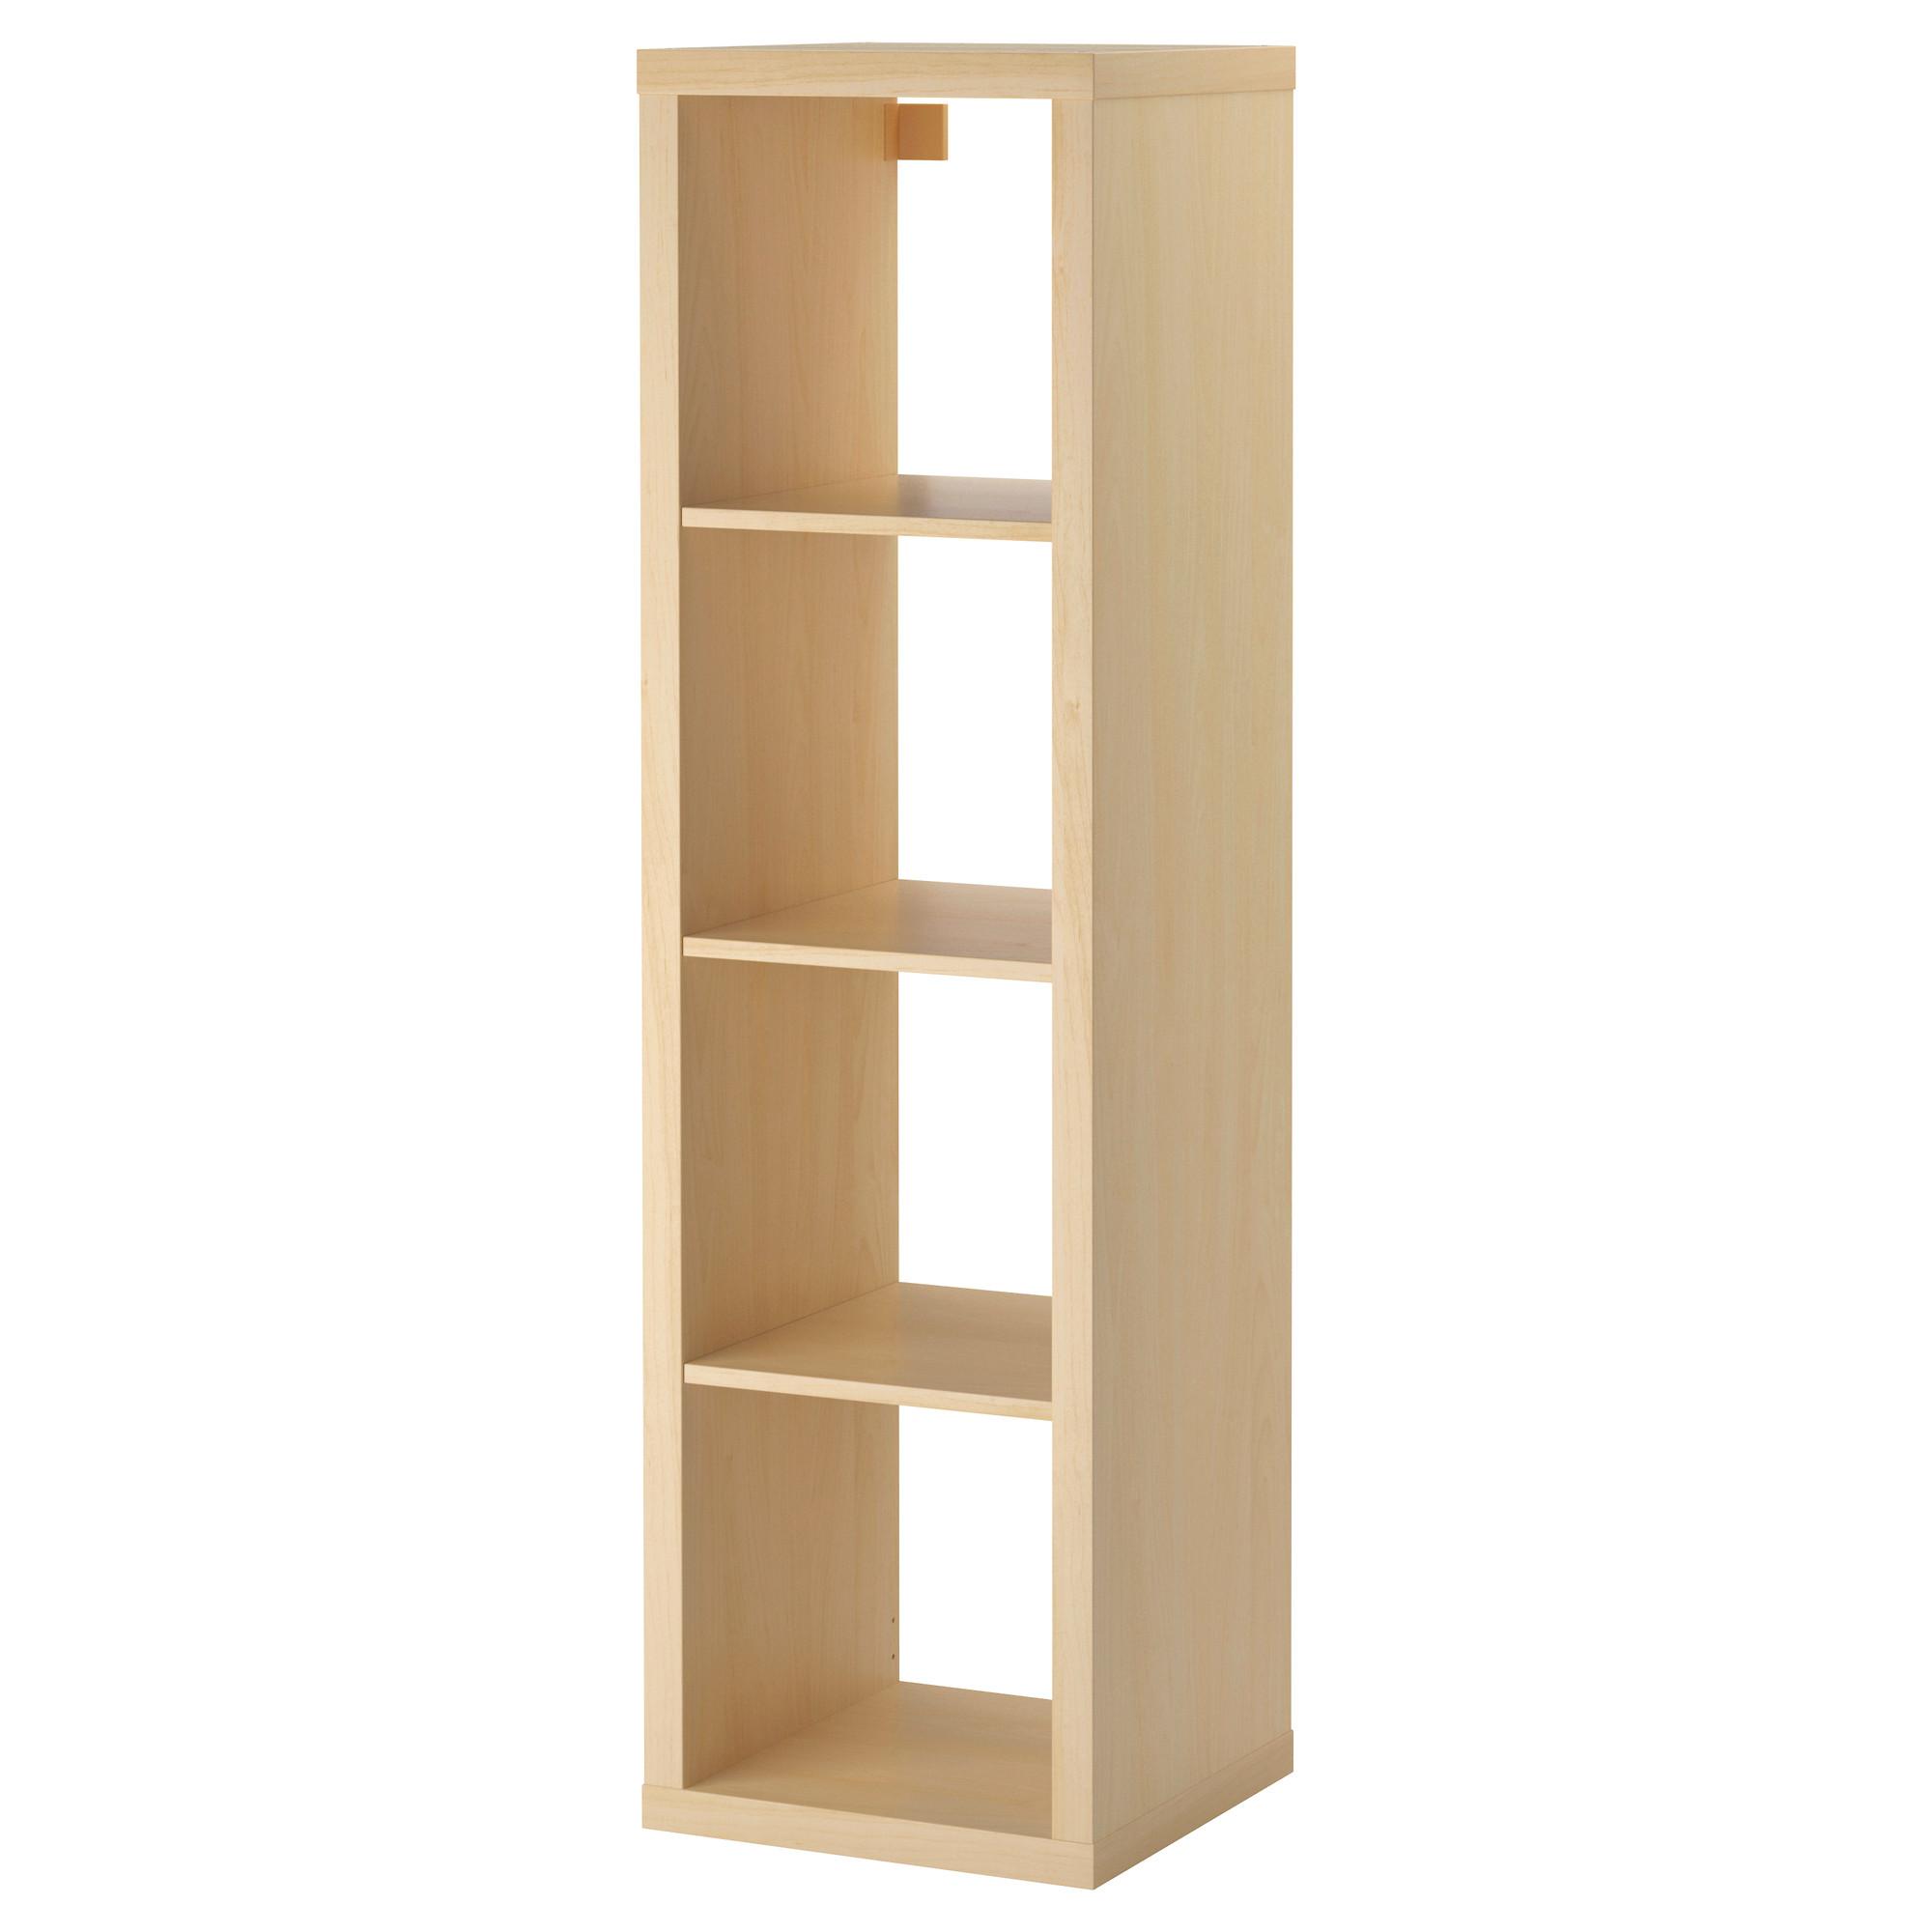 shelf units kallax shelf unit - white - ikea JLEDZFG